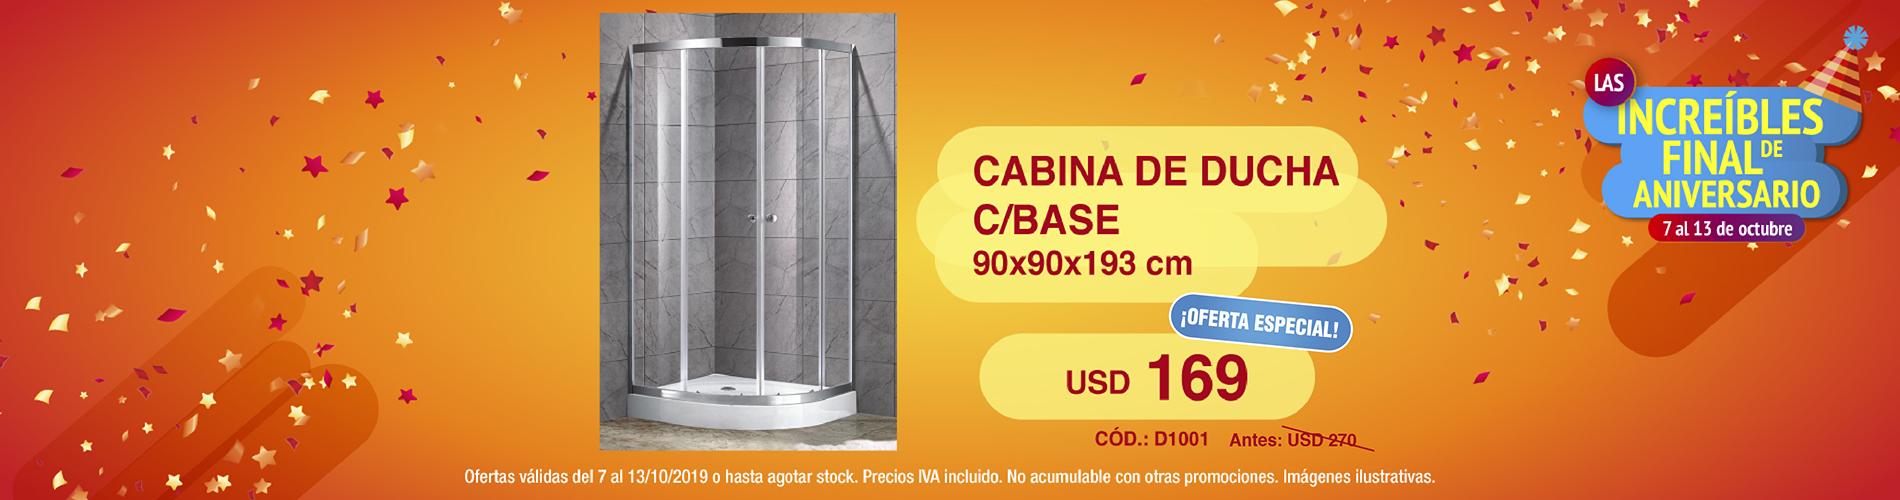 final cabina de ducha